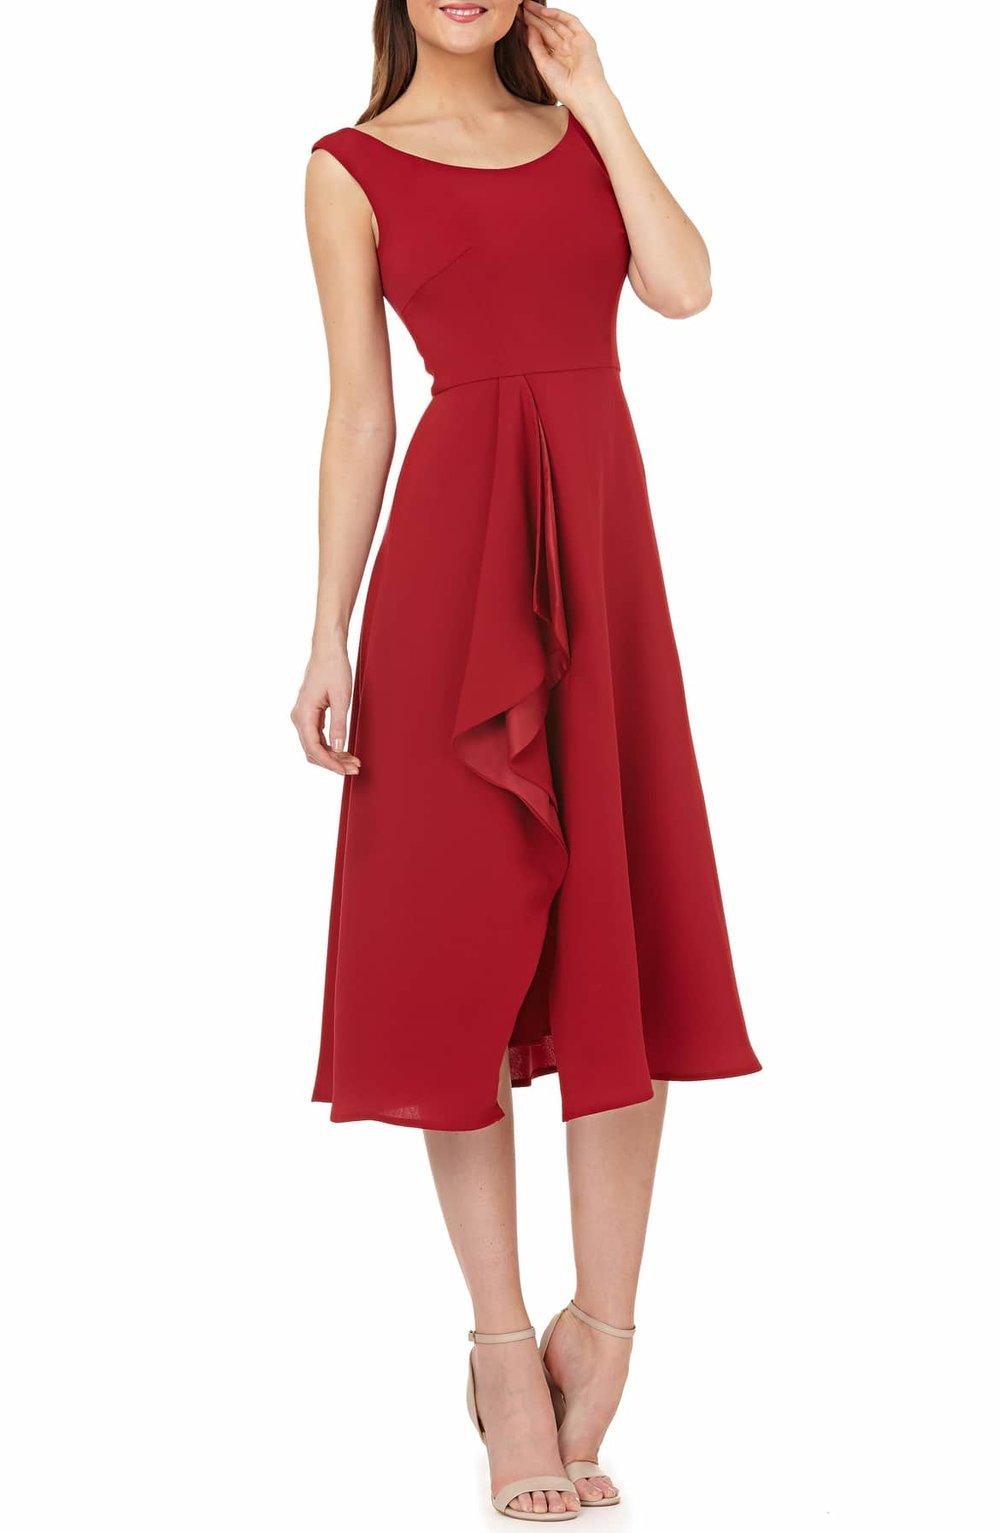 Carmen Marc Valvo Infusion Cascade Dress - $298.00